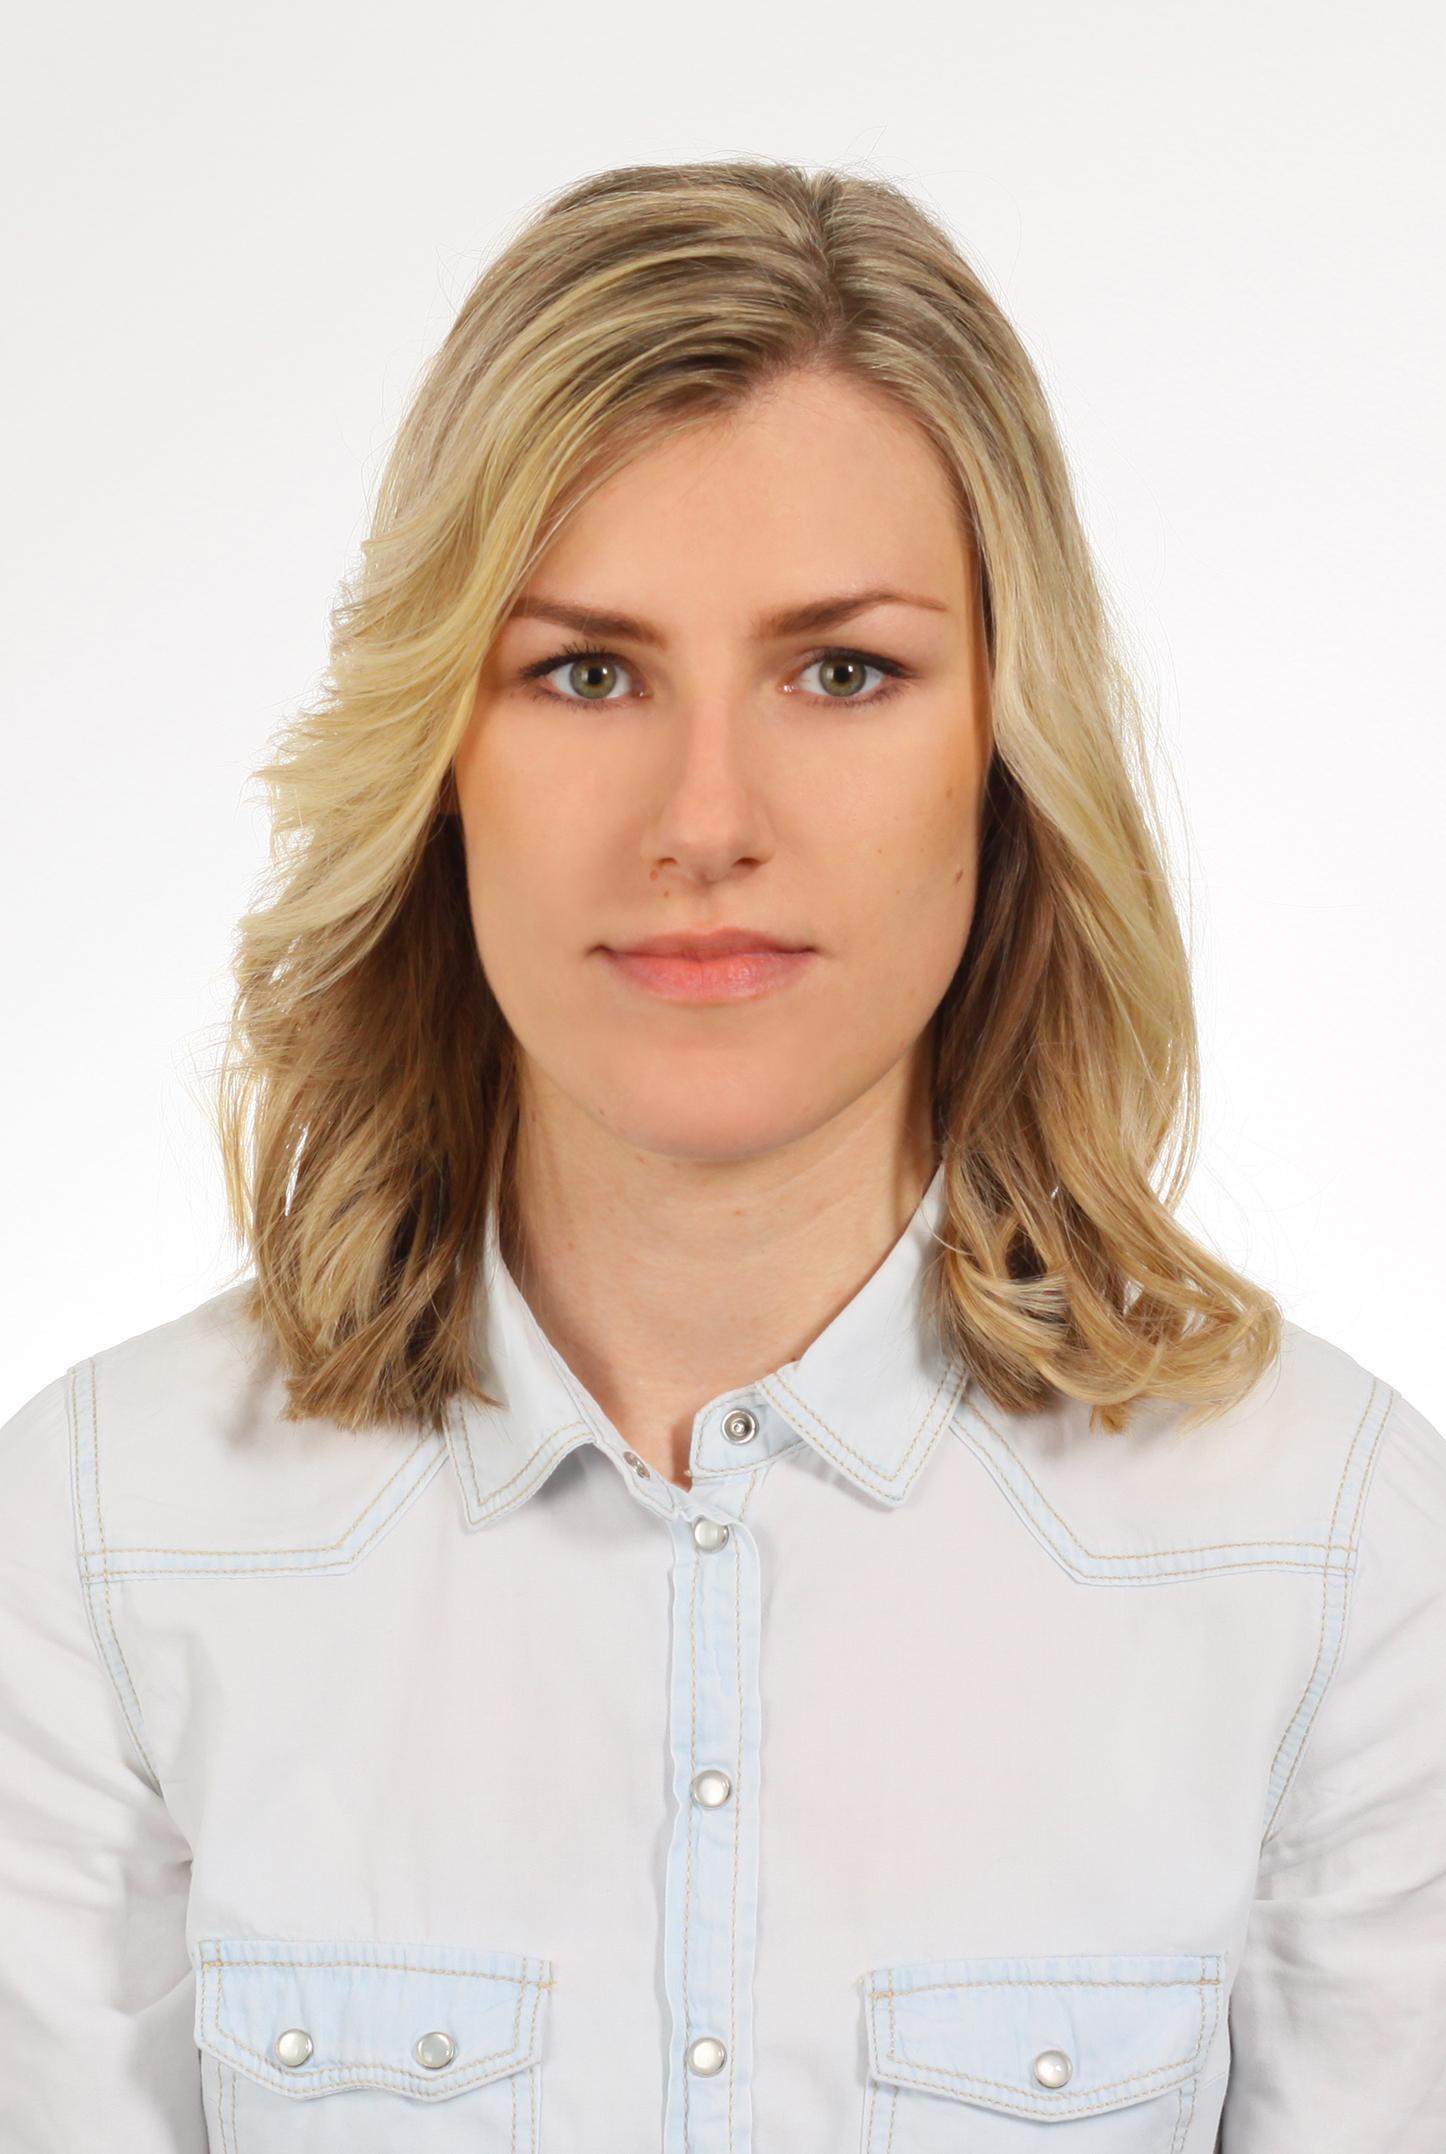 Beata Porębska